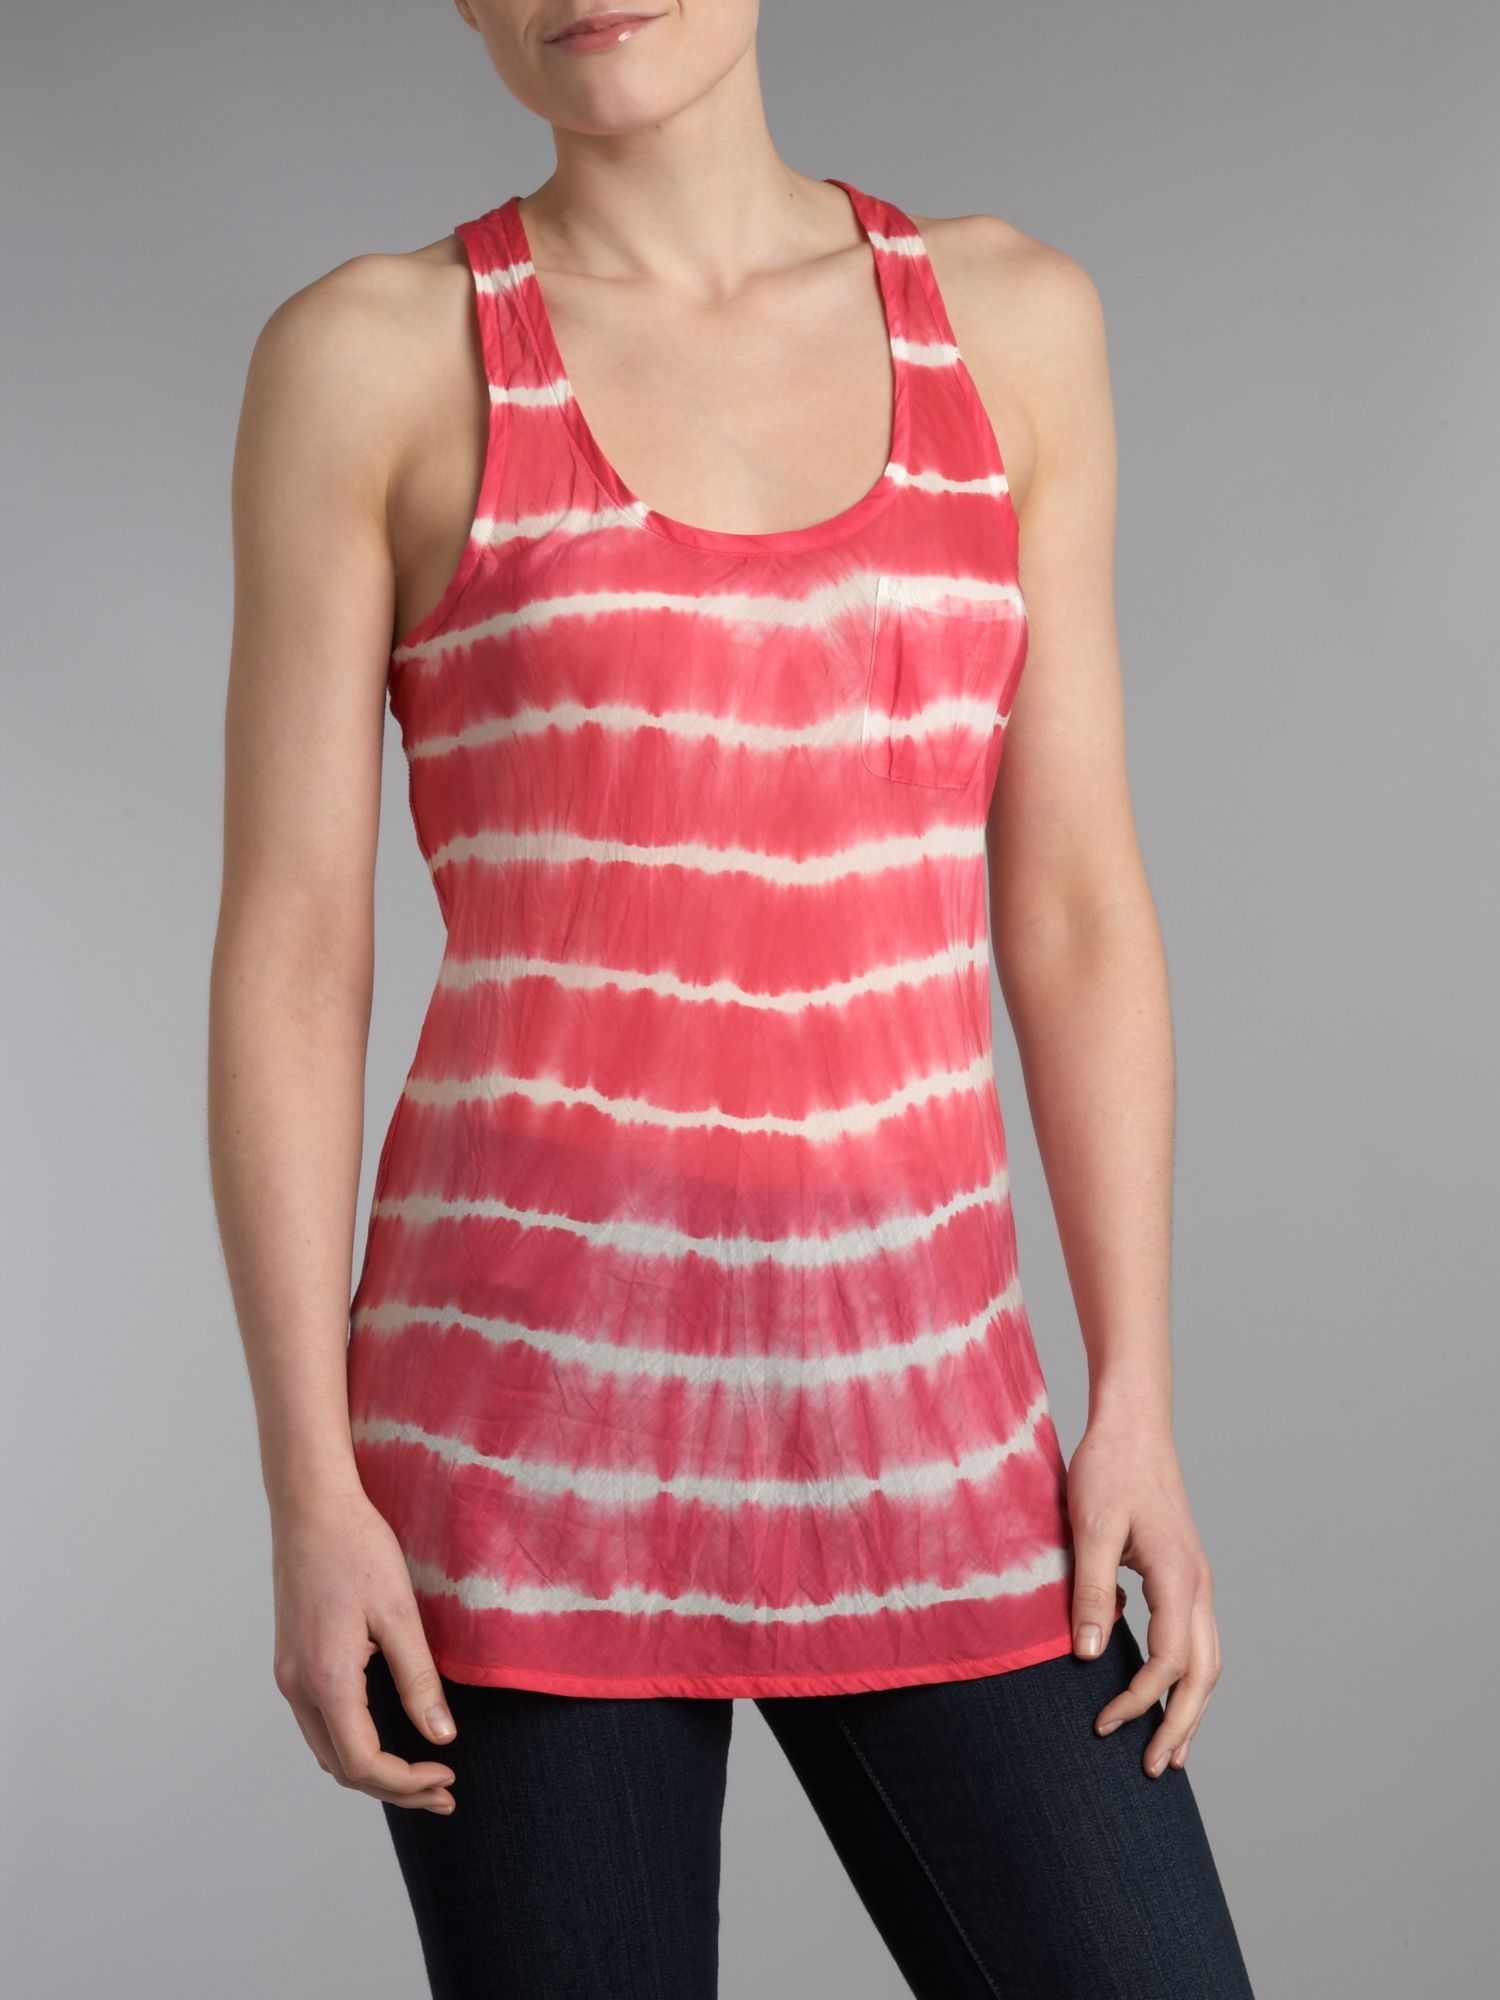 Lyst denim supply ralph lauren sleeveless tie dye vest for Tie dye sleeveless shirts